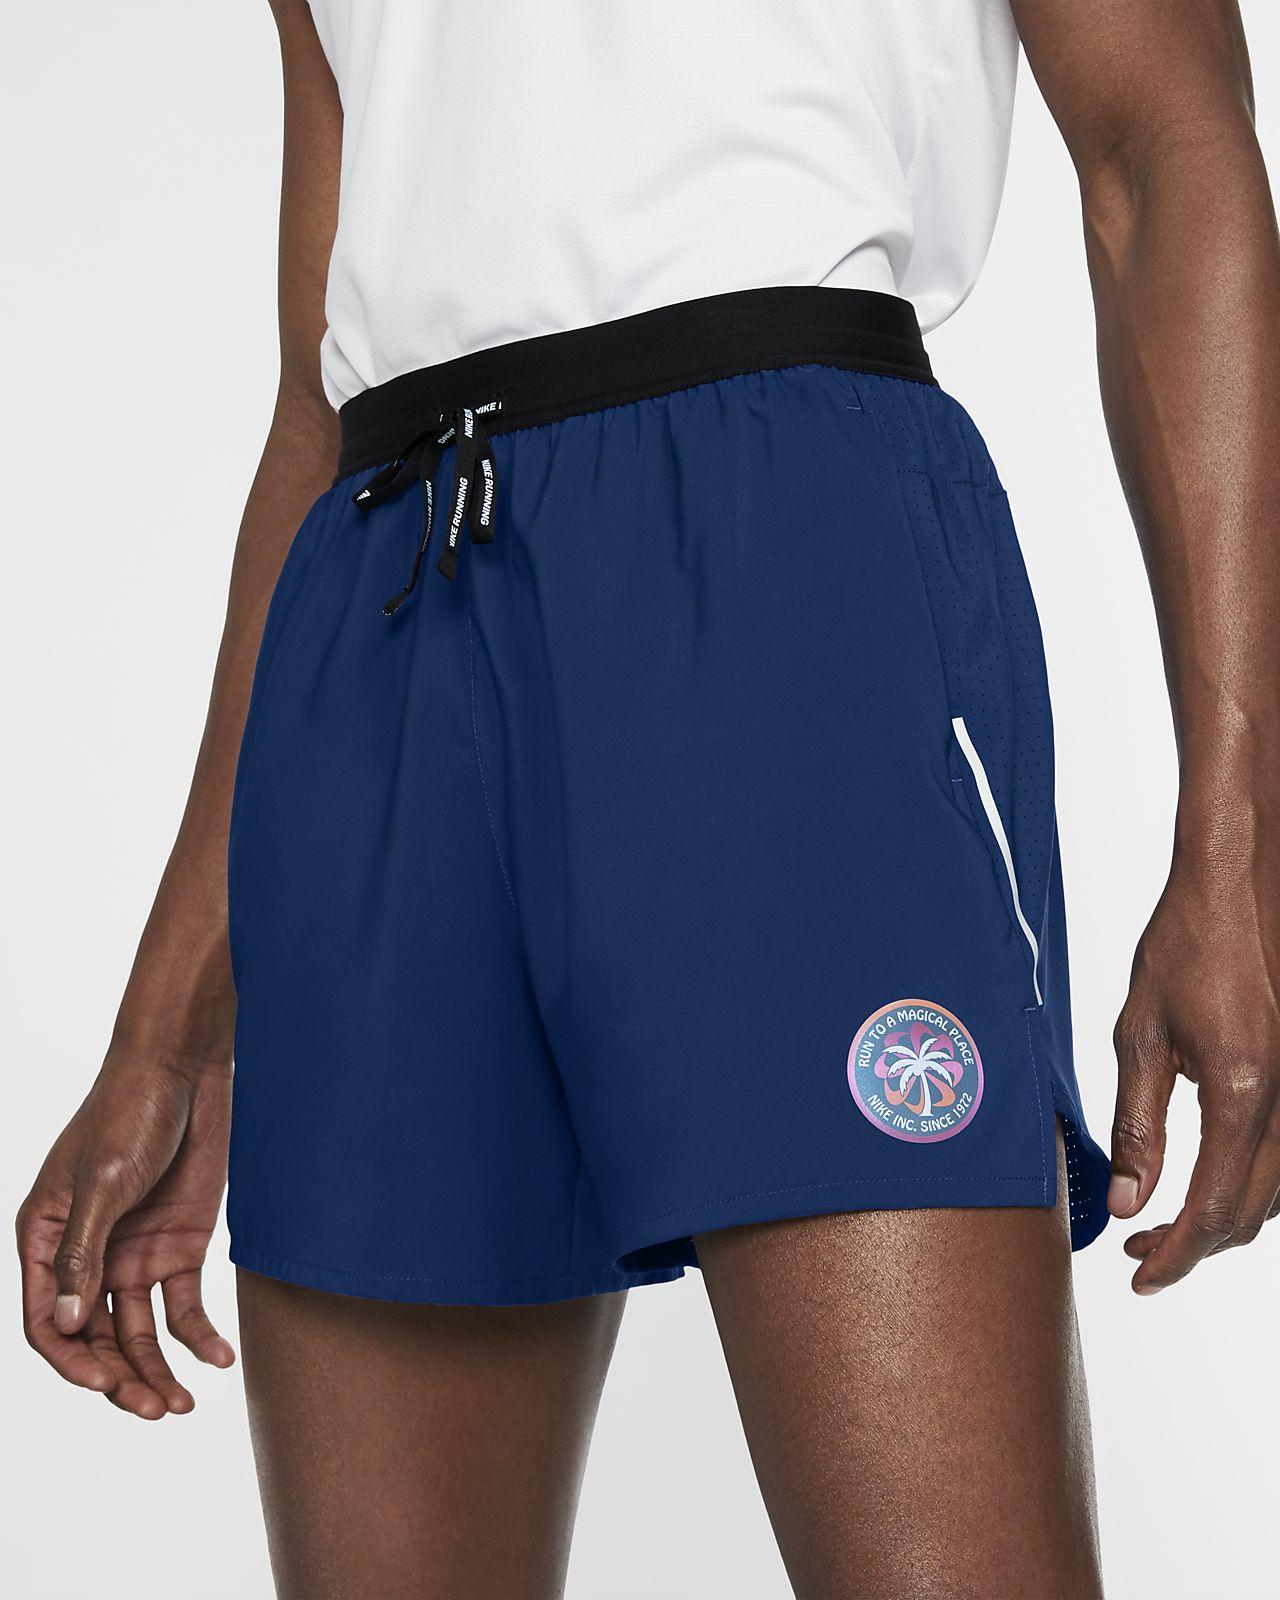 Short de running doublé Nike Flex Stride 13 cm